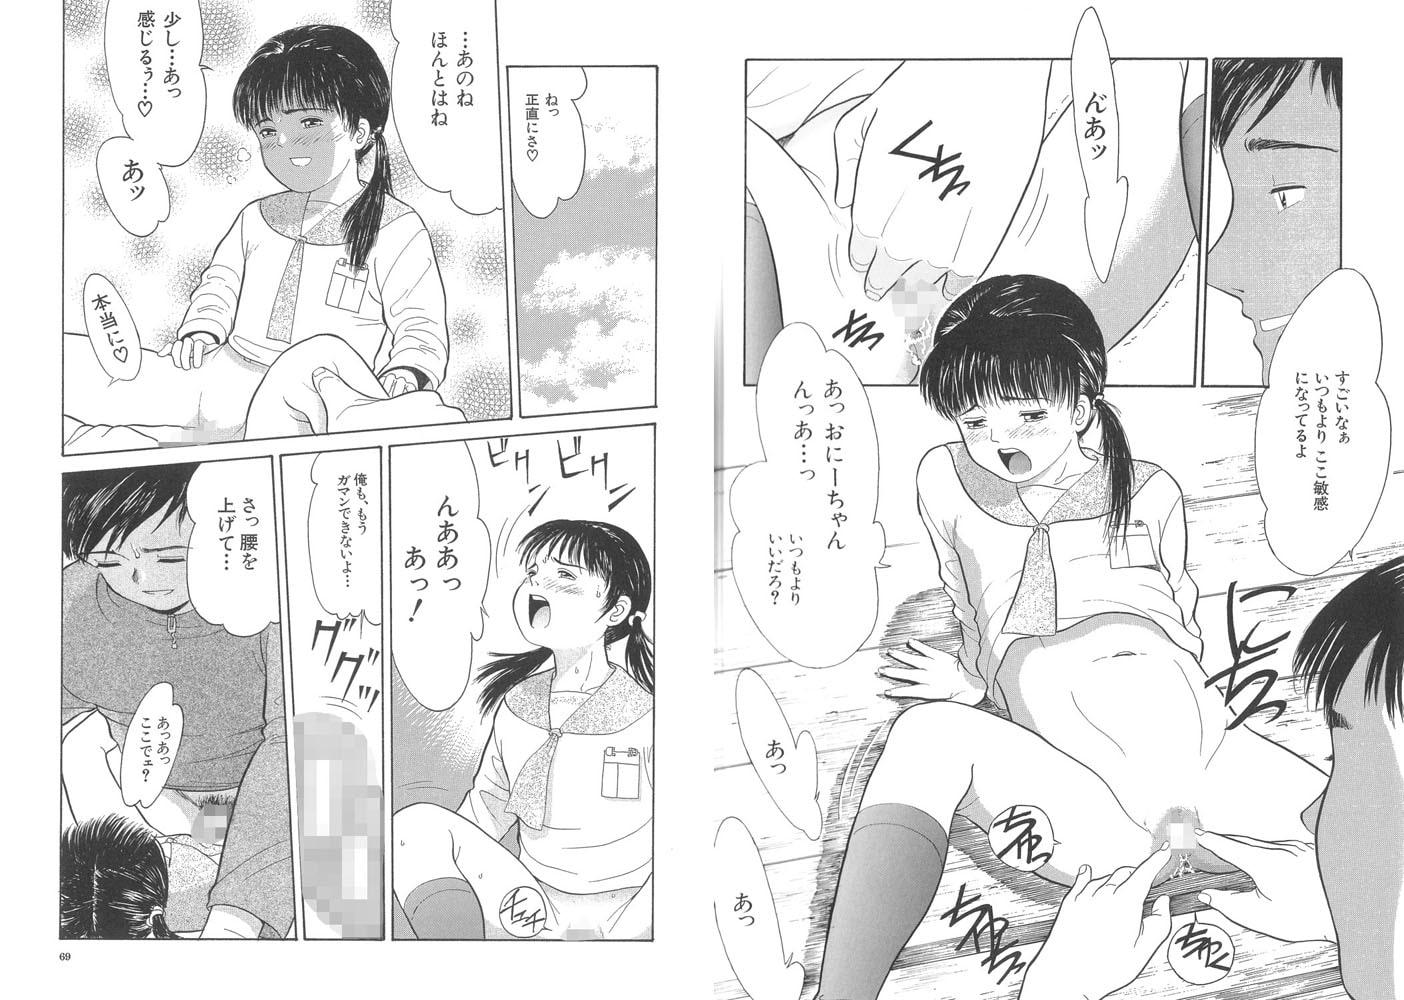 路草【1話体験版付き】